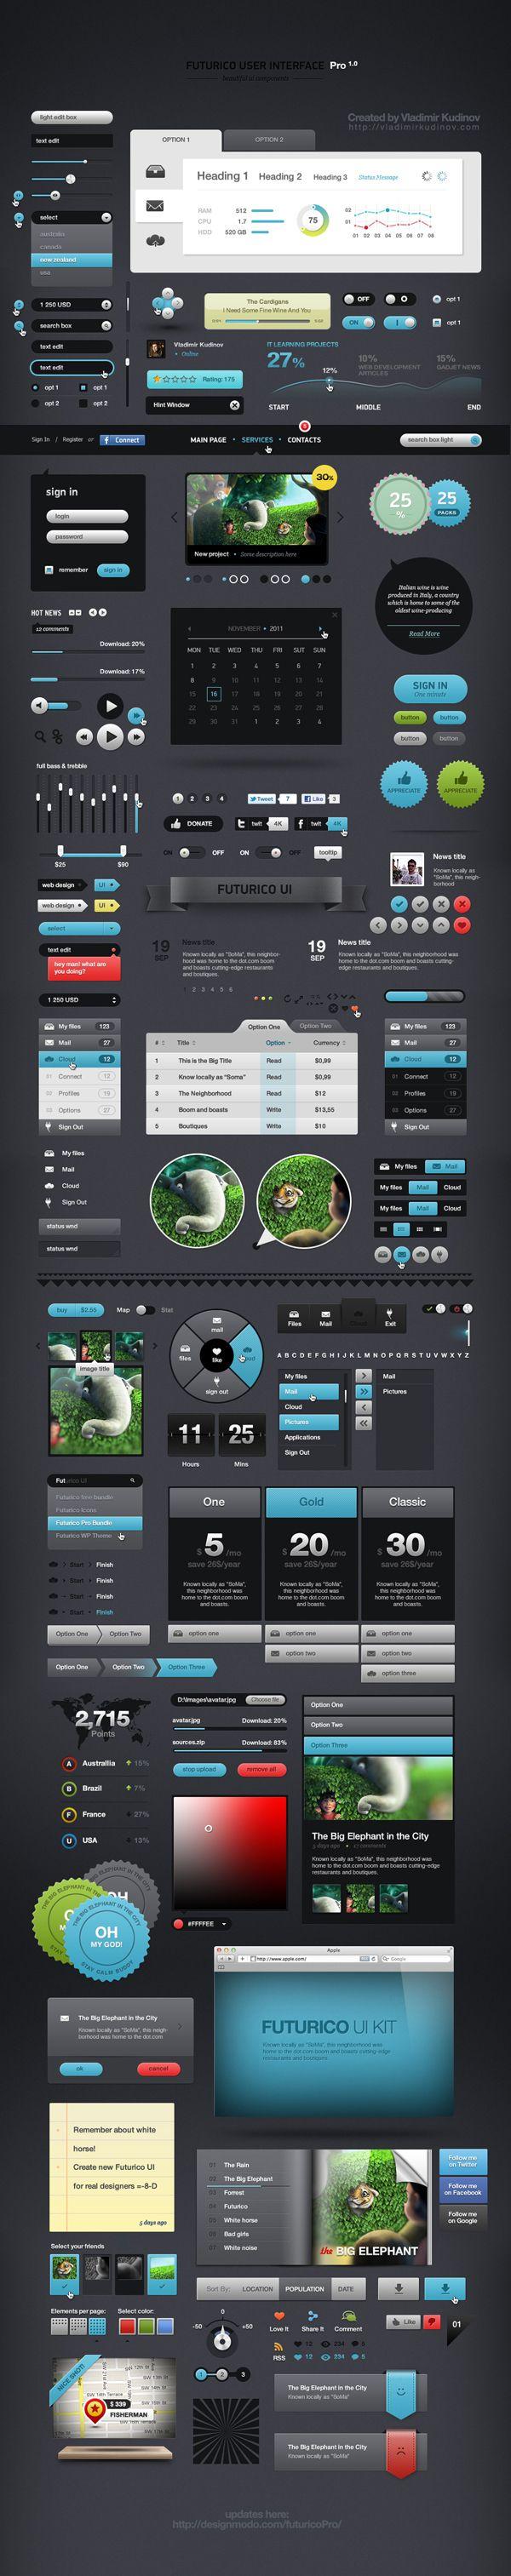 Futurico User Interface Pro on Behance